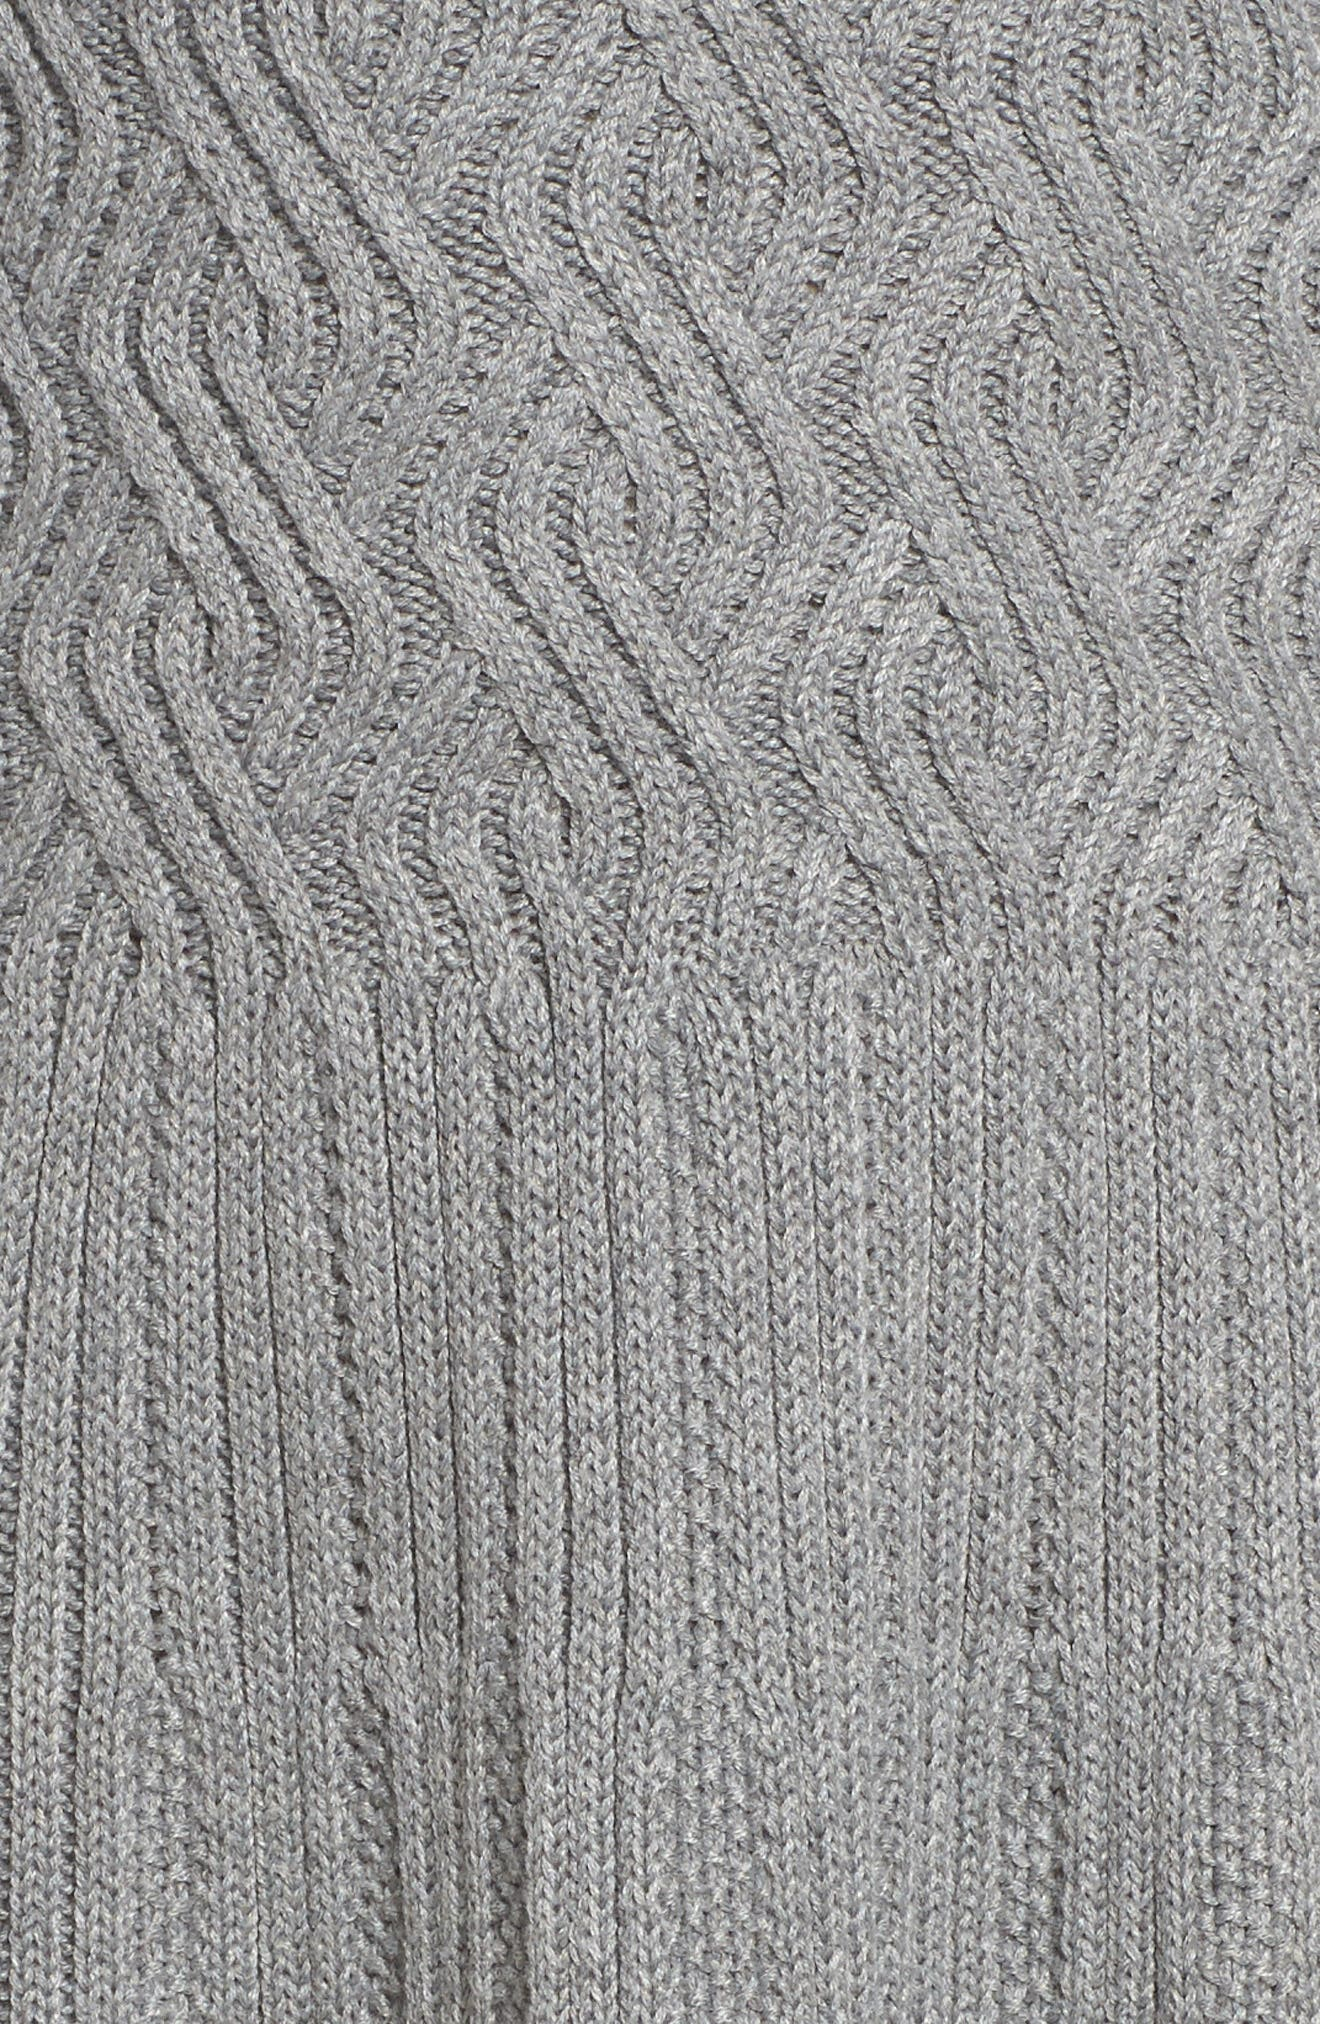 Cowl Neck Sweater Dress,                             Alternate thumbnail 5, color,                             030